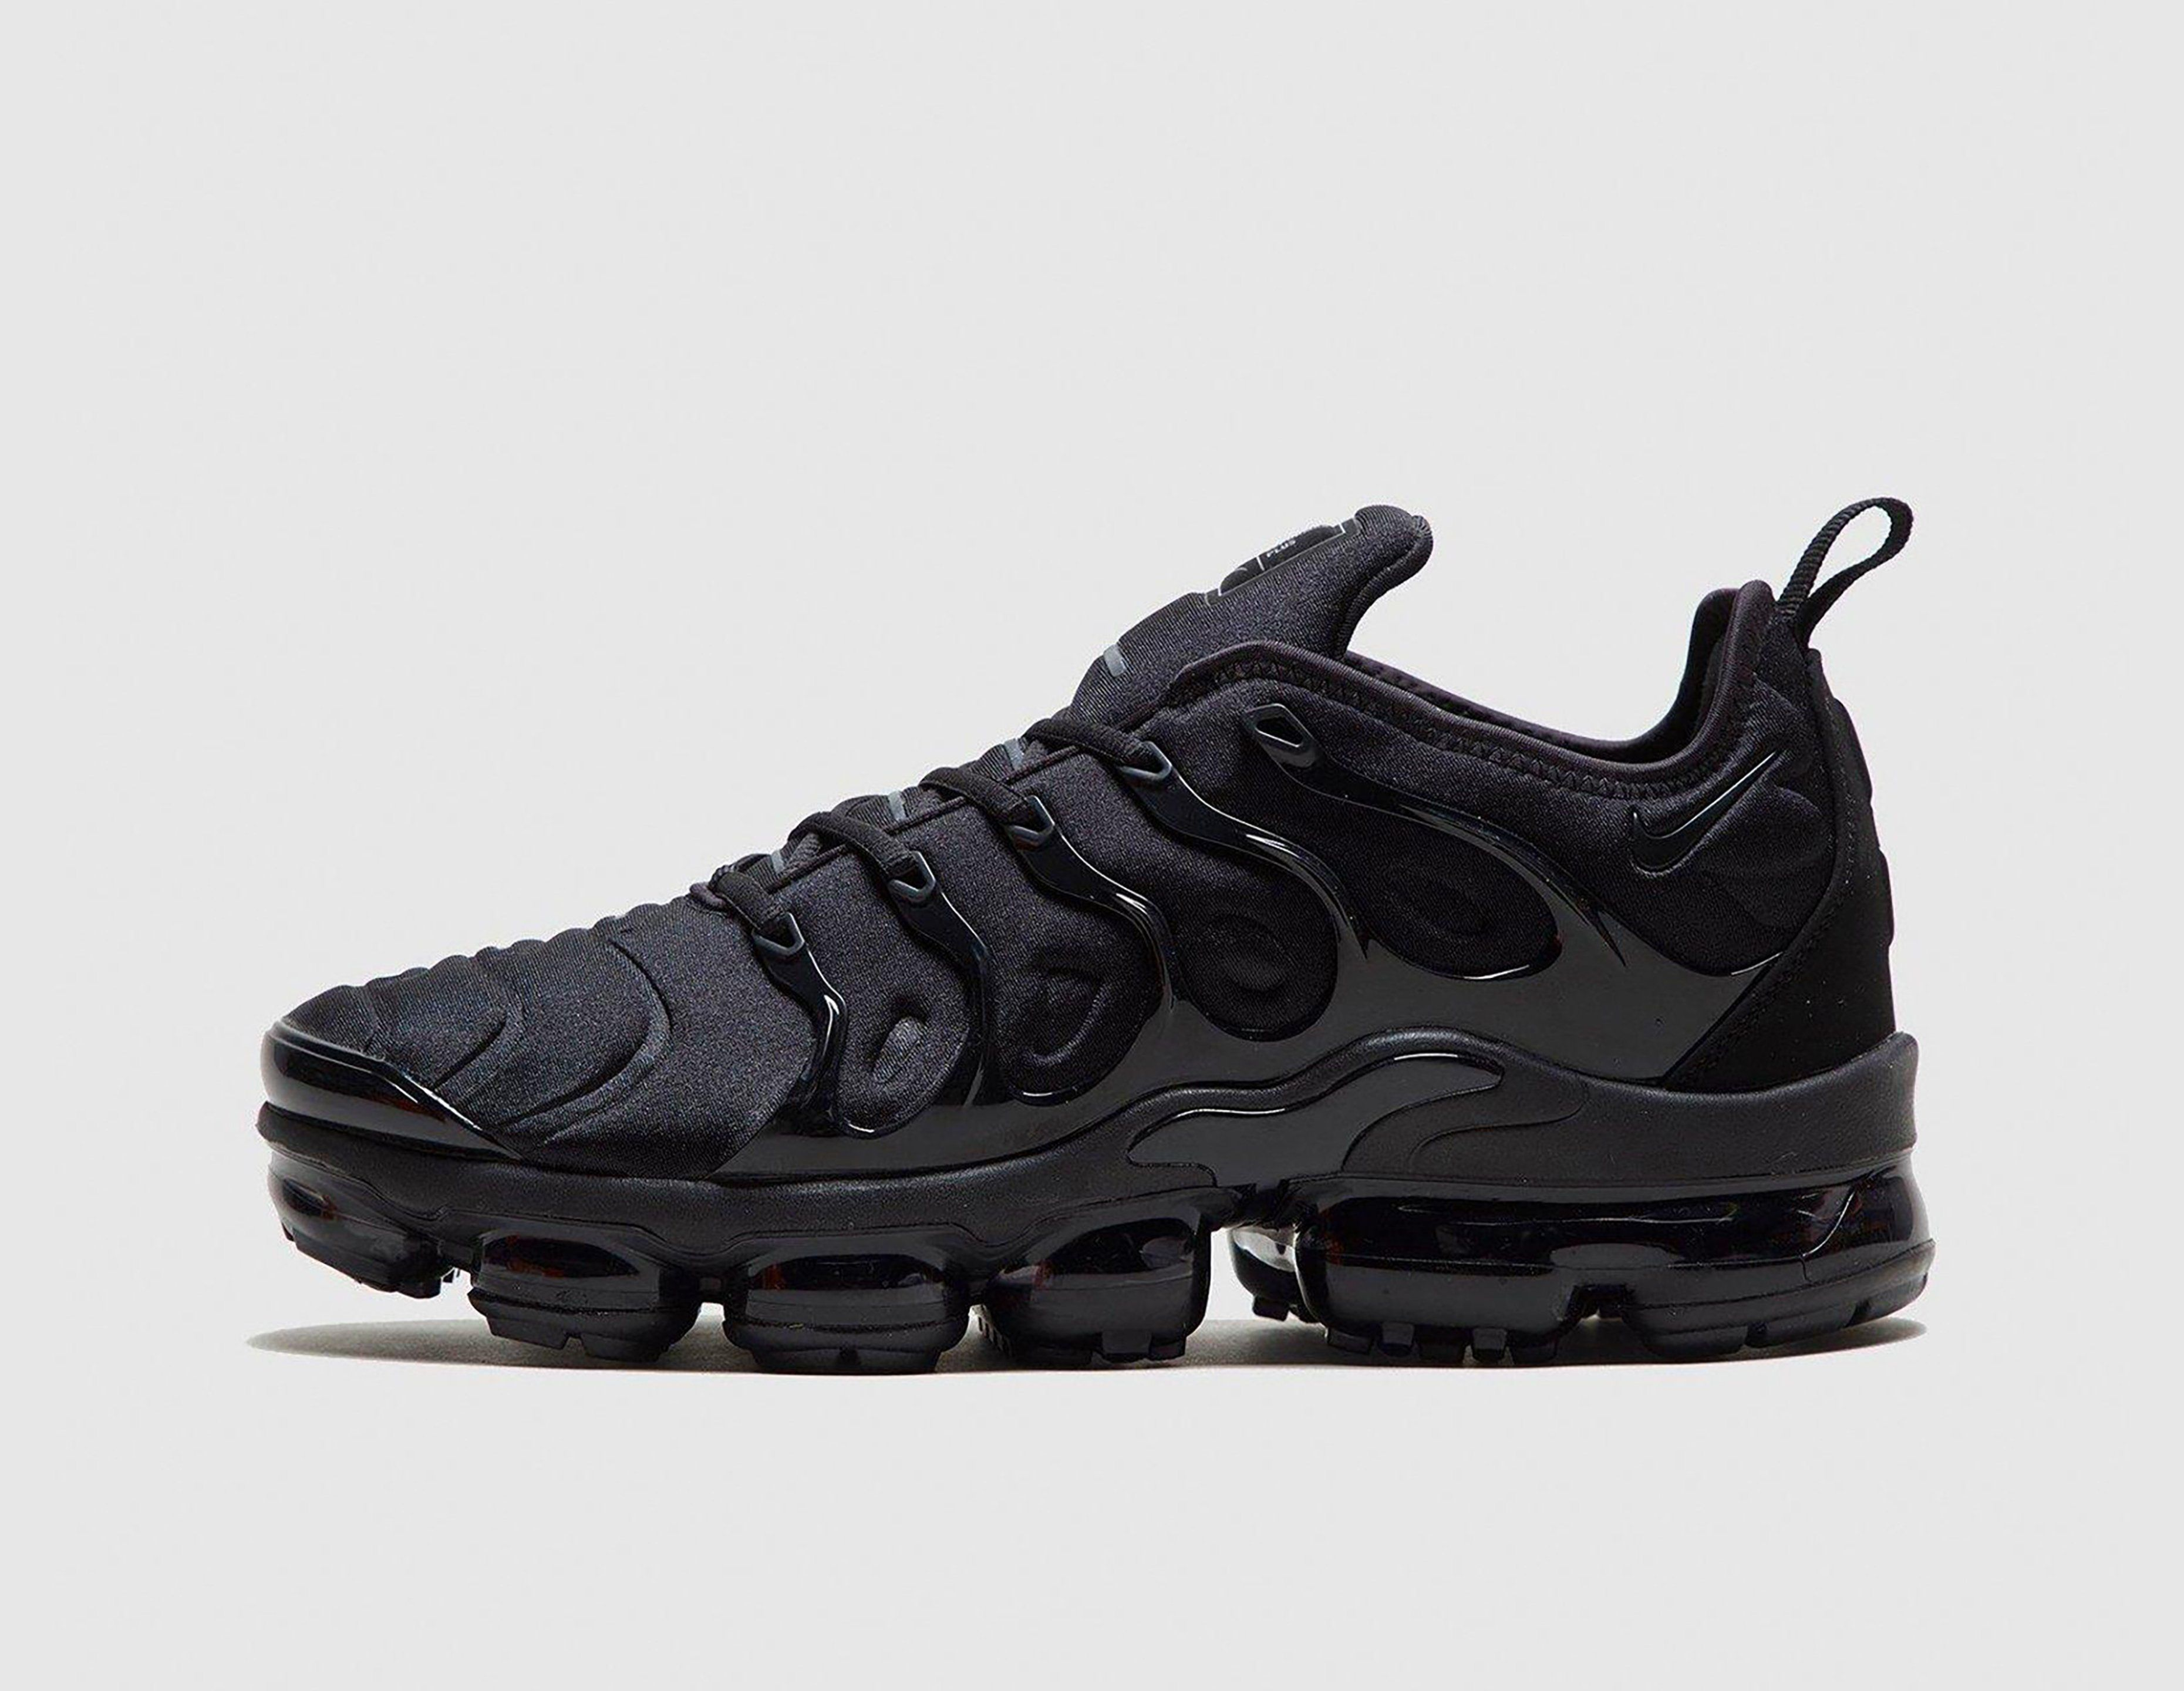 96e052206dc Nike Air VaporMax Plus